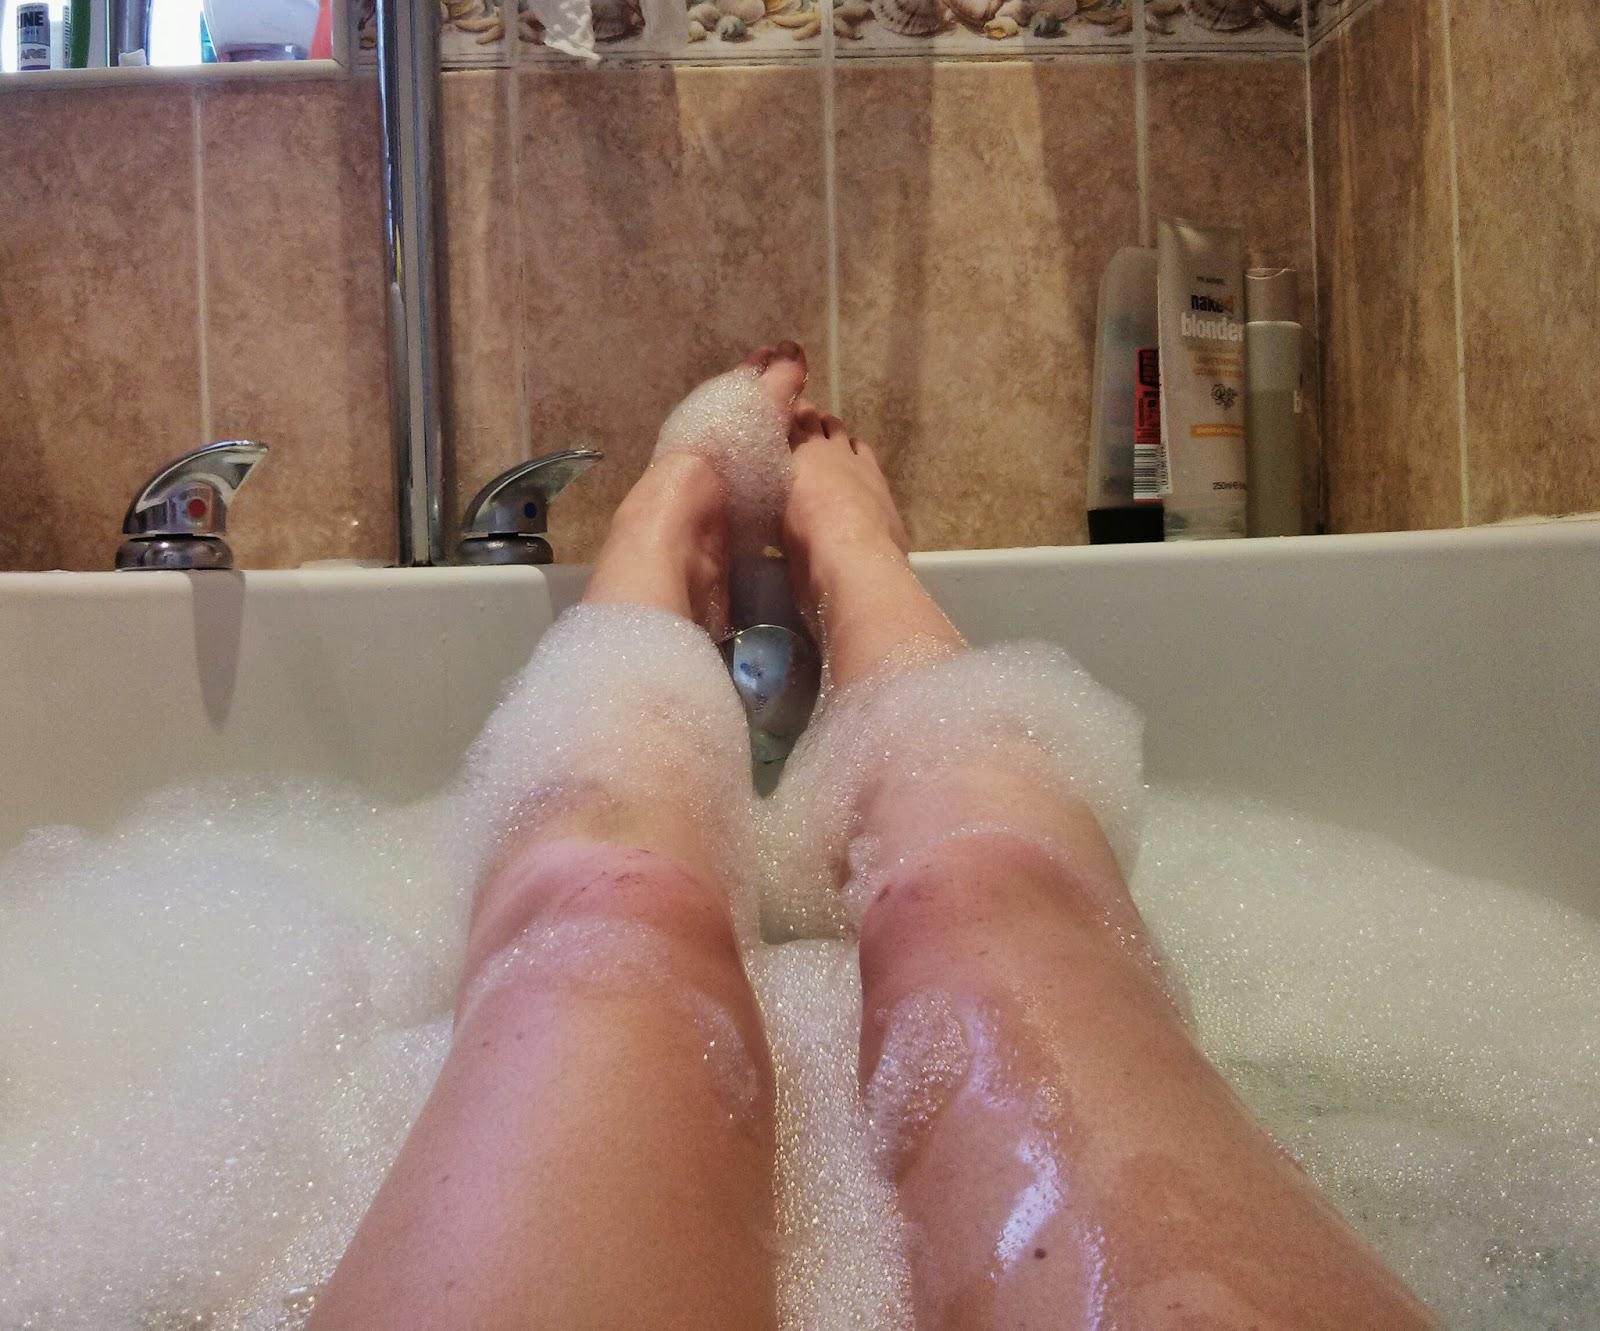 A well deserved bath